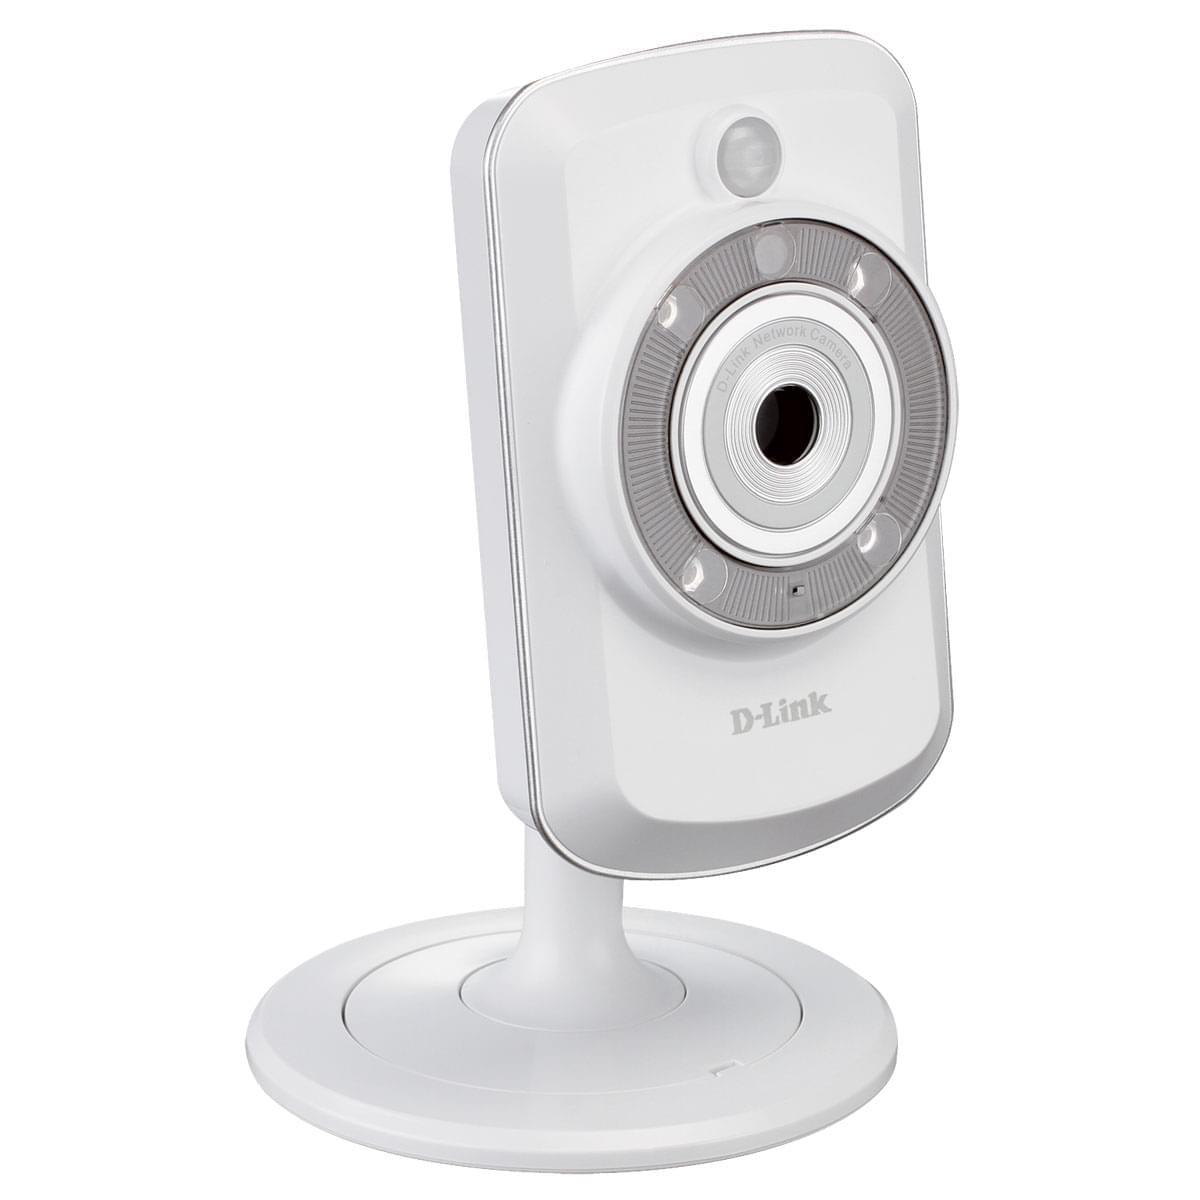 D-Link DCS-942L MyDlink Enhanced Wireless N (IP,IR,WiFi) (DCS-942L soldé) - Achat / Vente Caméra / Webcam sur Cybertek.fr - 0